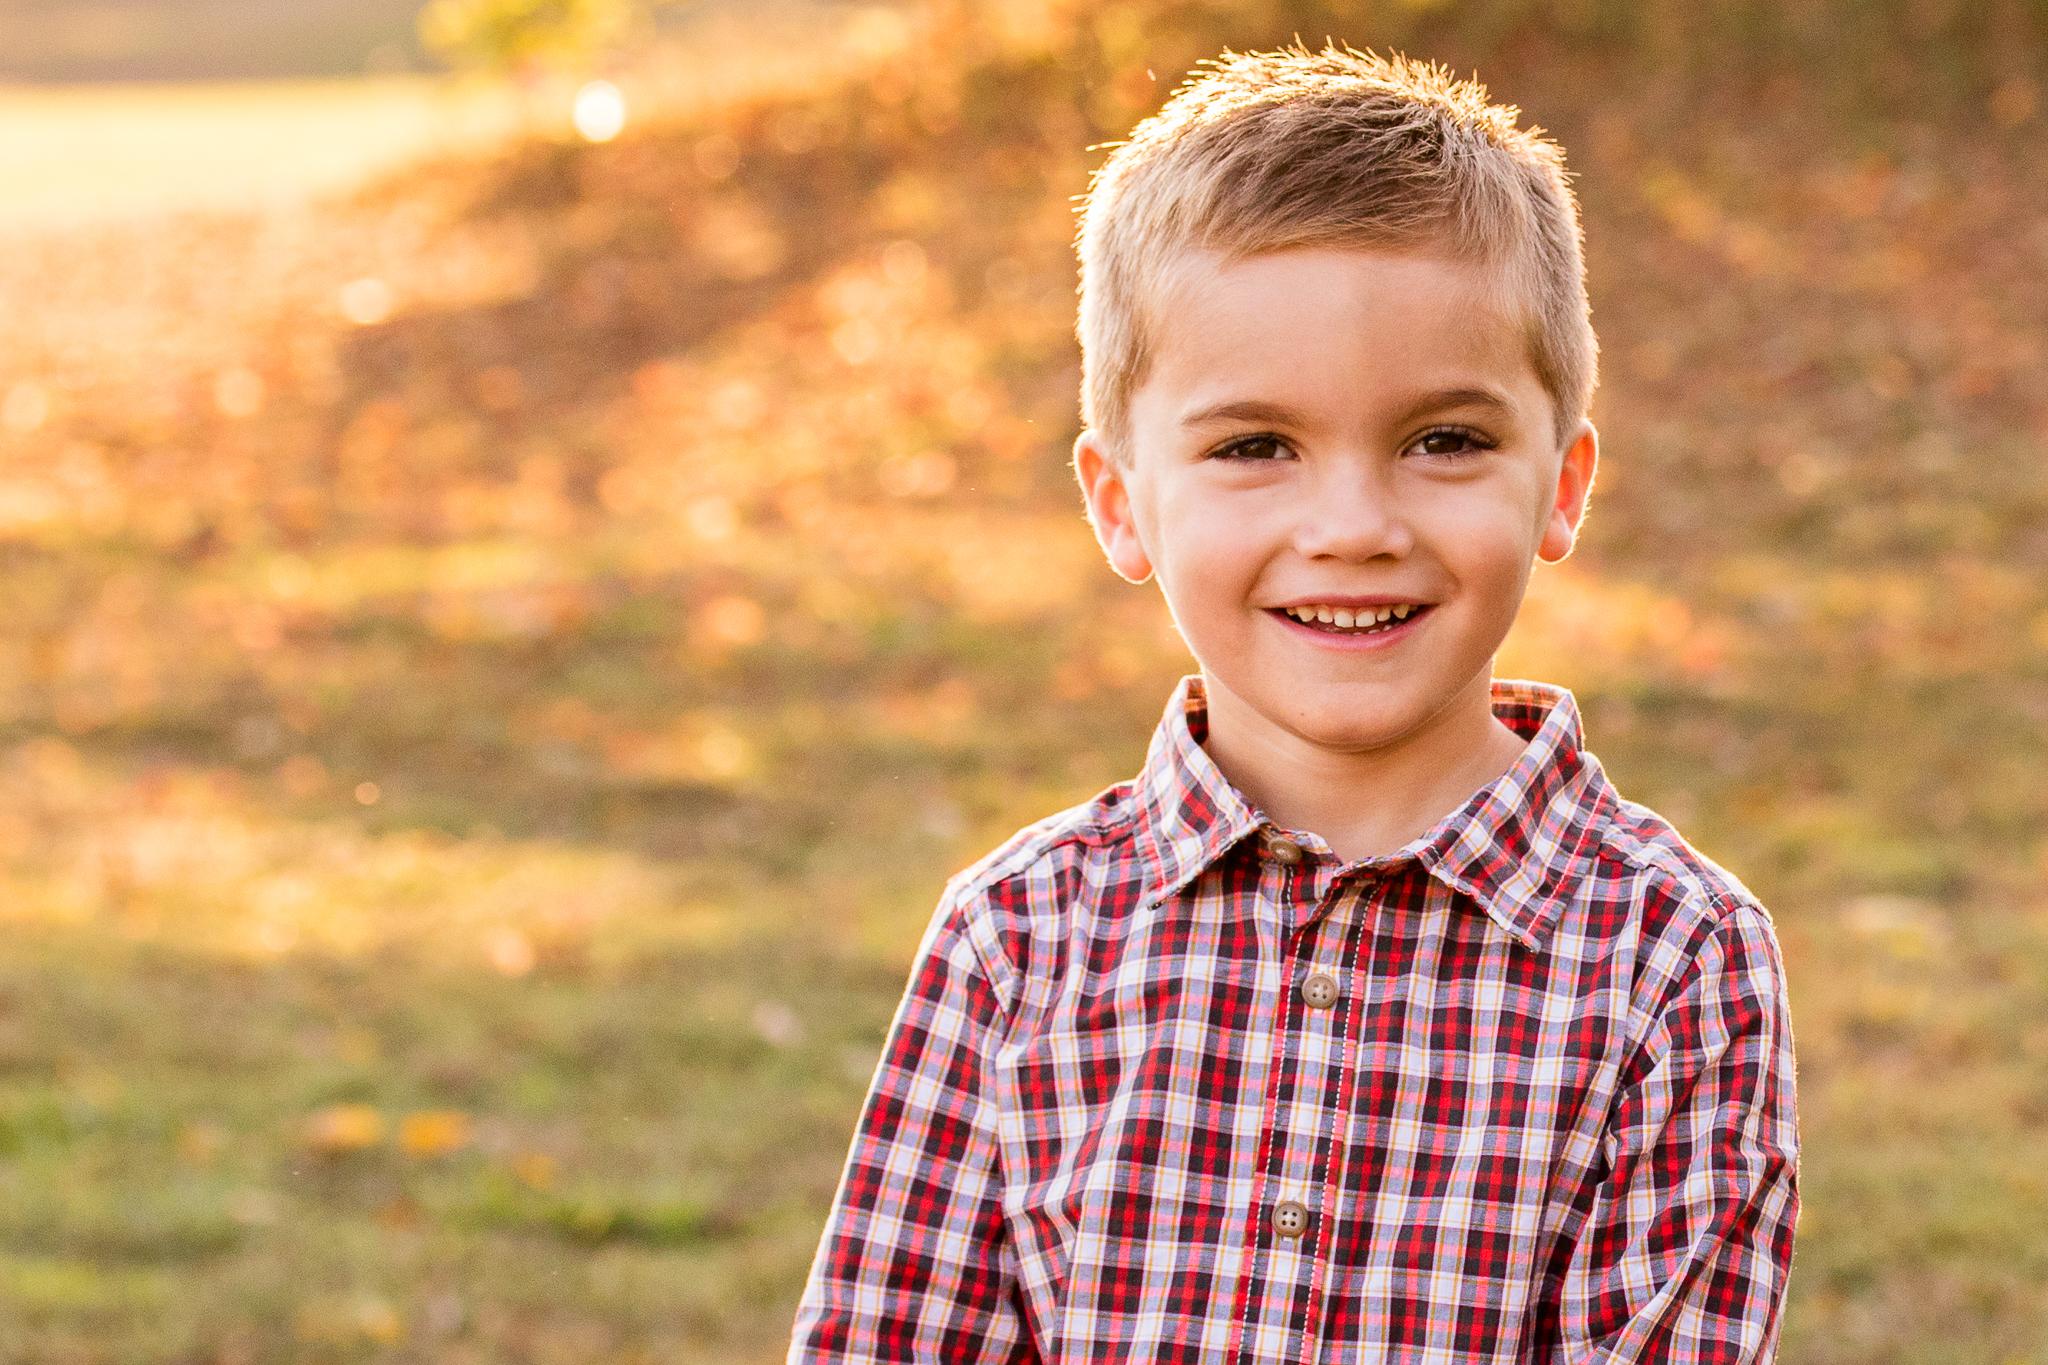 NancyElizabeth New Jersey Family Photographer | Smiling Preschooler Portrait